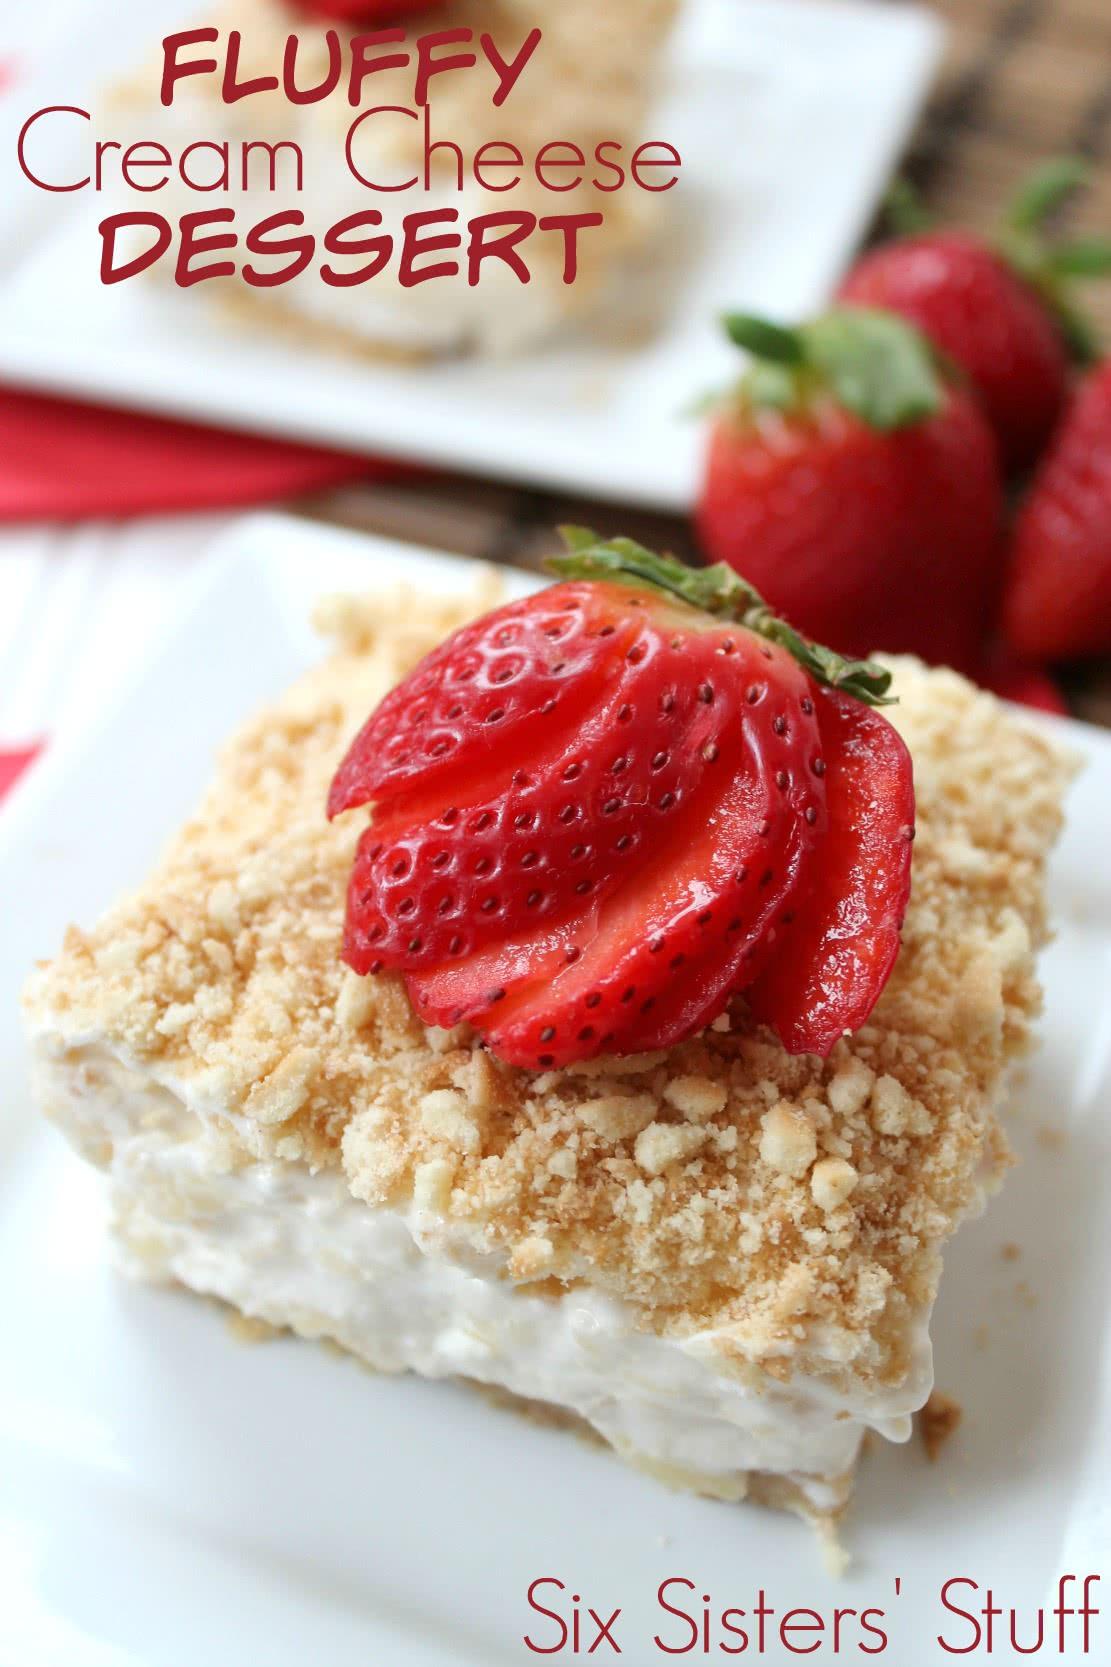 Fluffy Cream Cheese Dessert 4